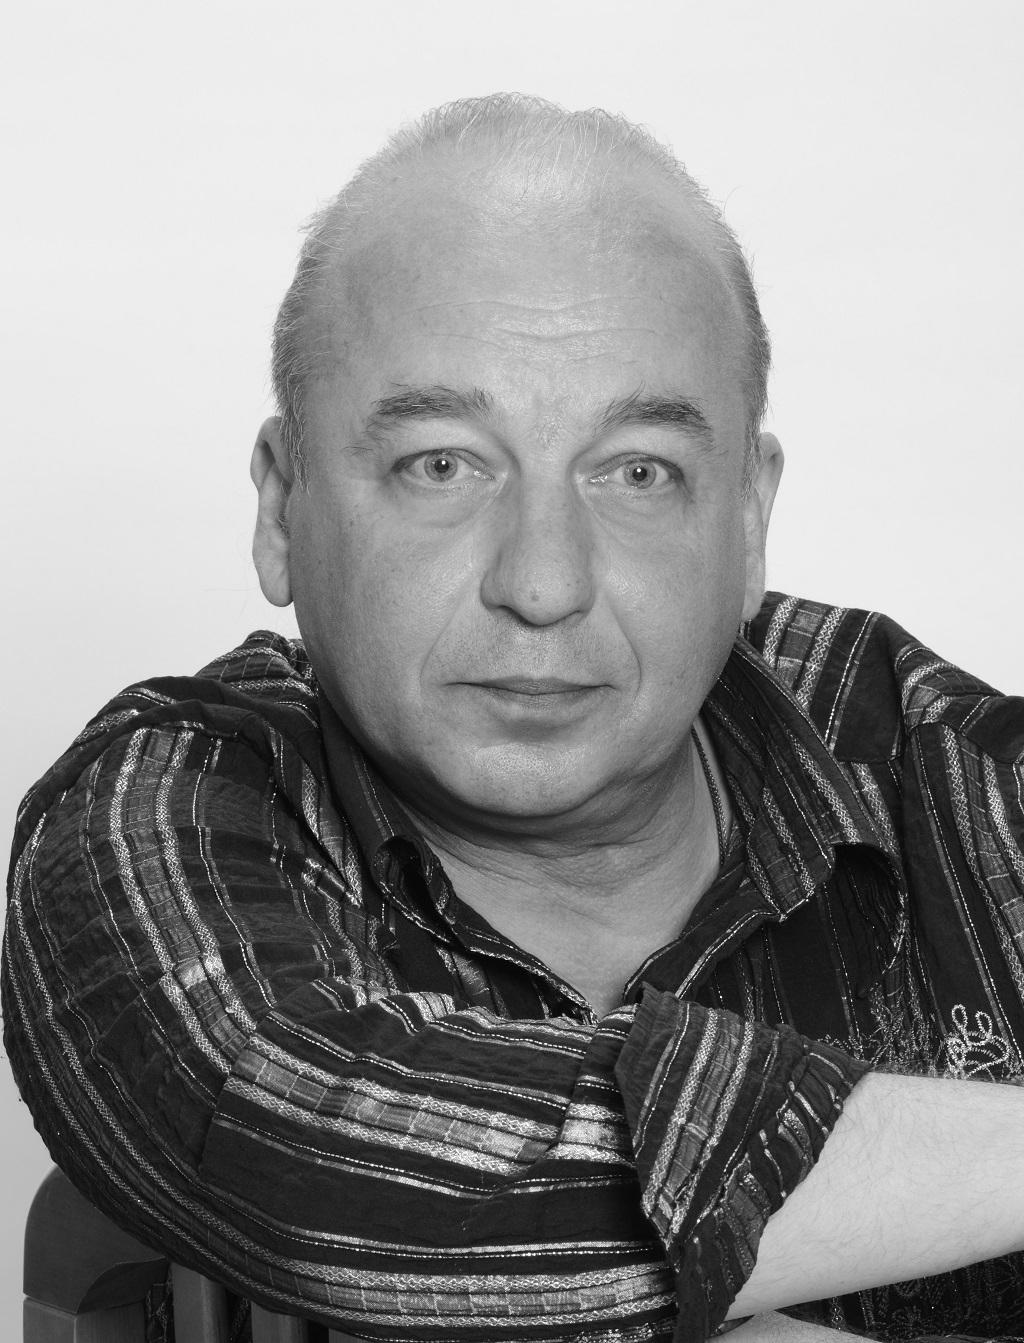 Народный артист РФ Аверин Владимир Иванович